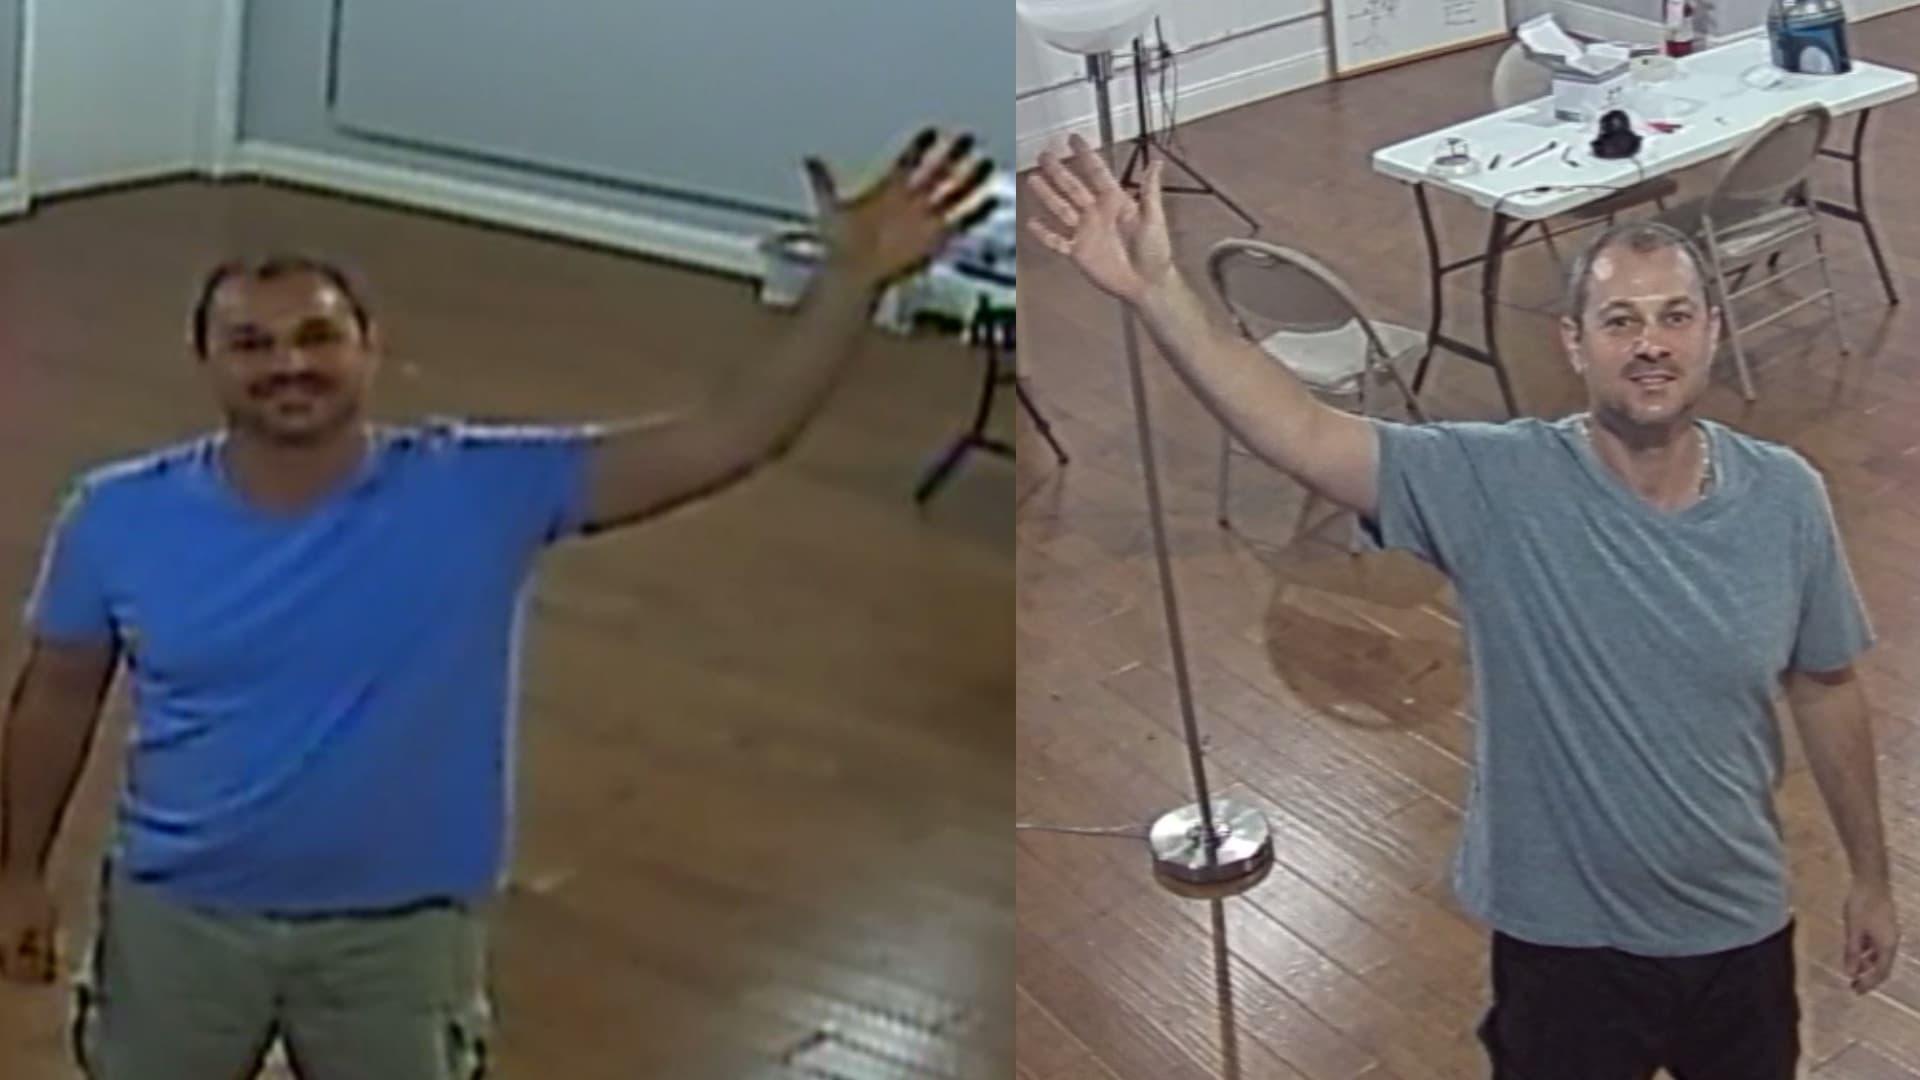 1080p HD Security Camera vs Analog CCTV Camera